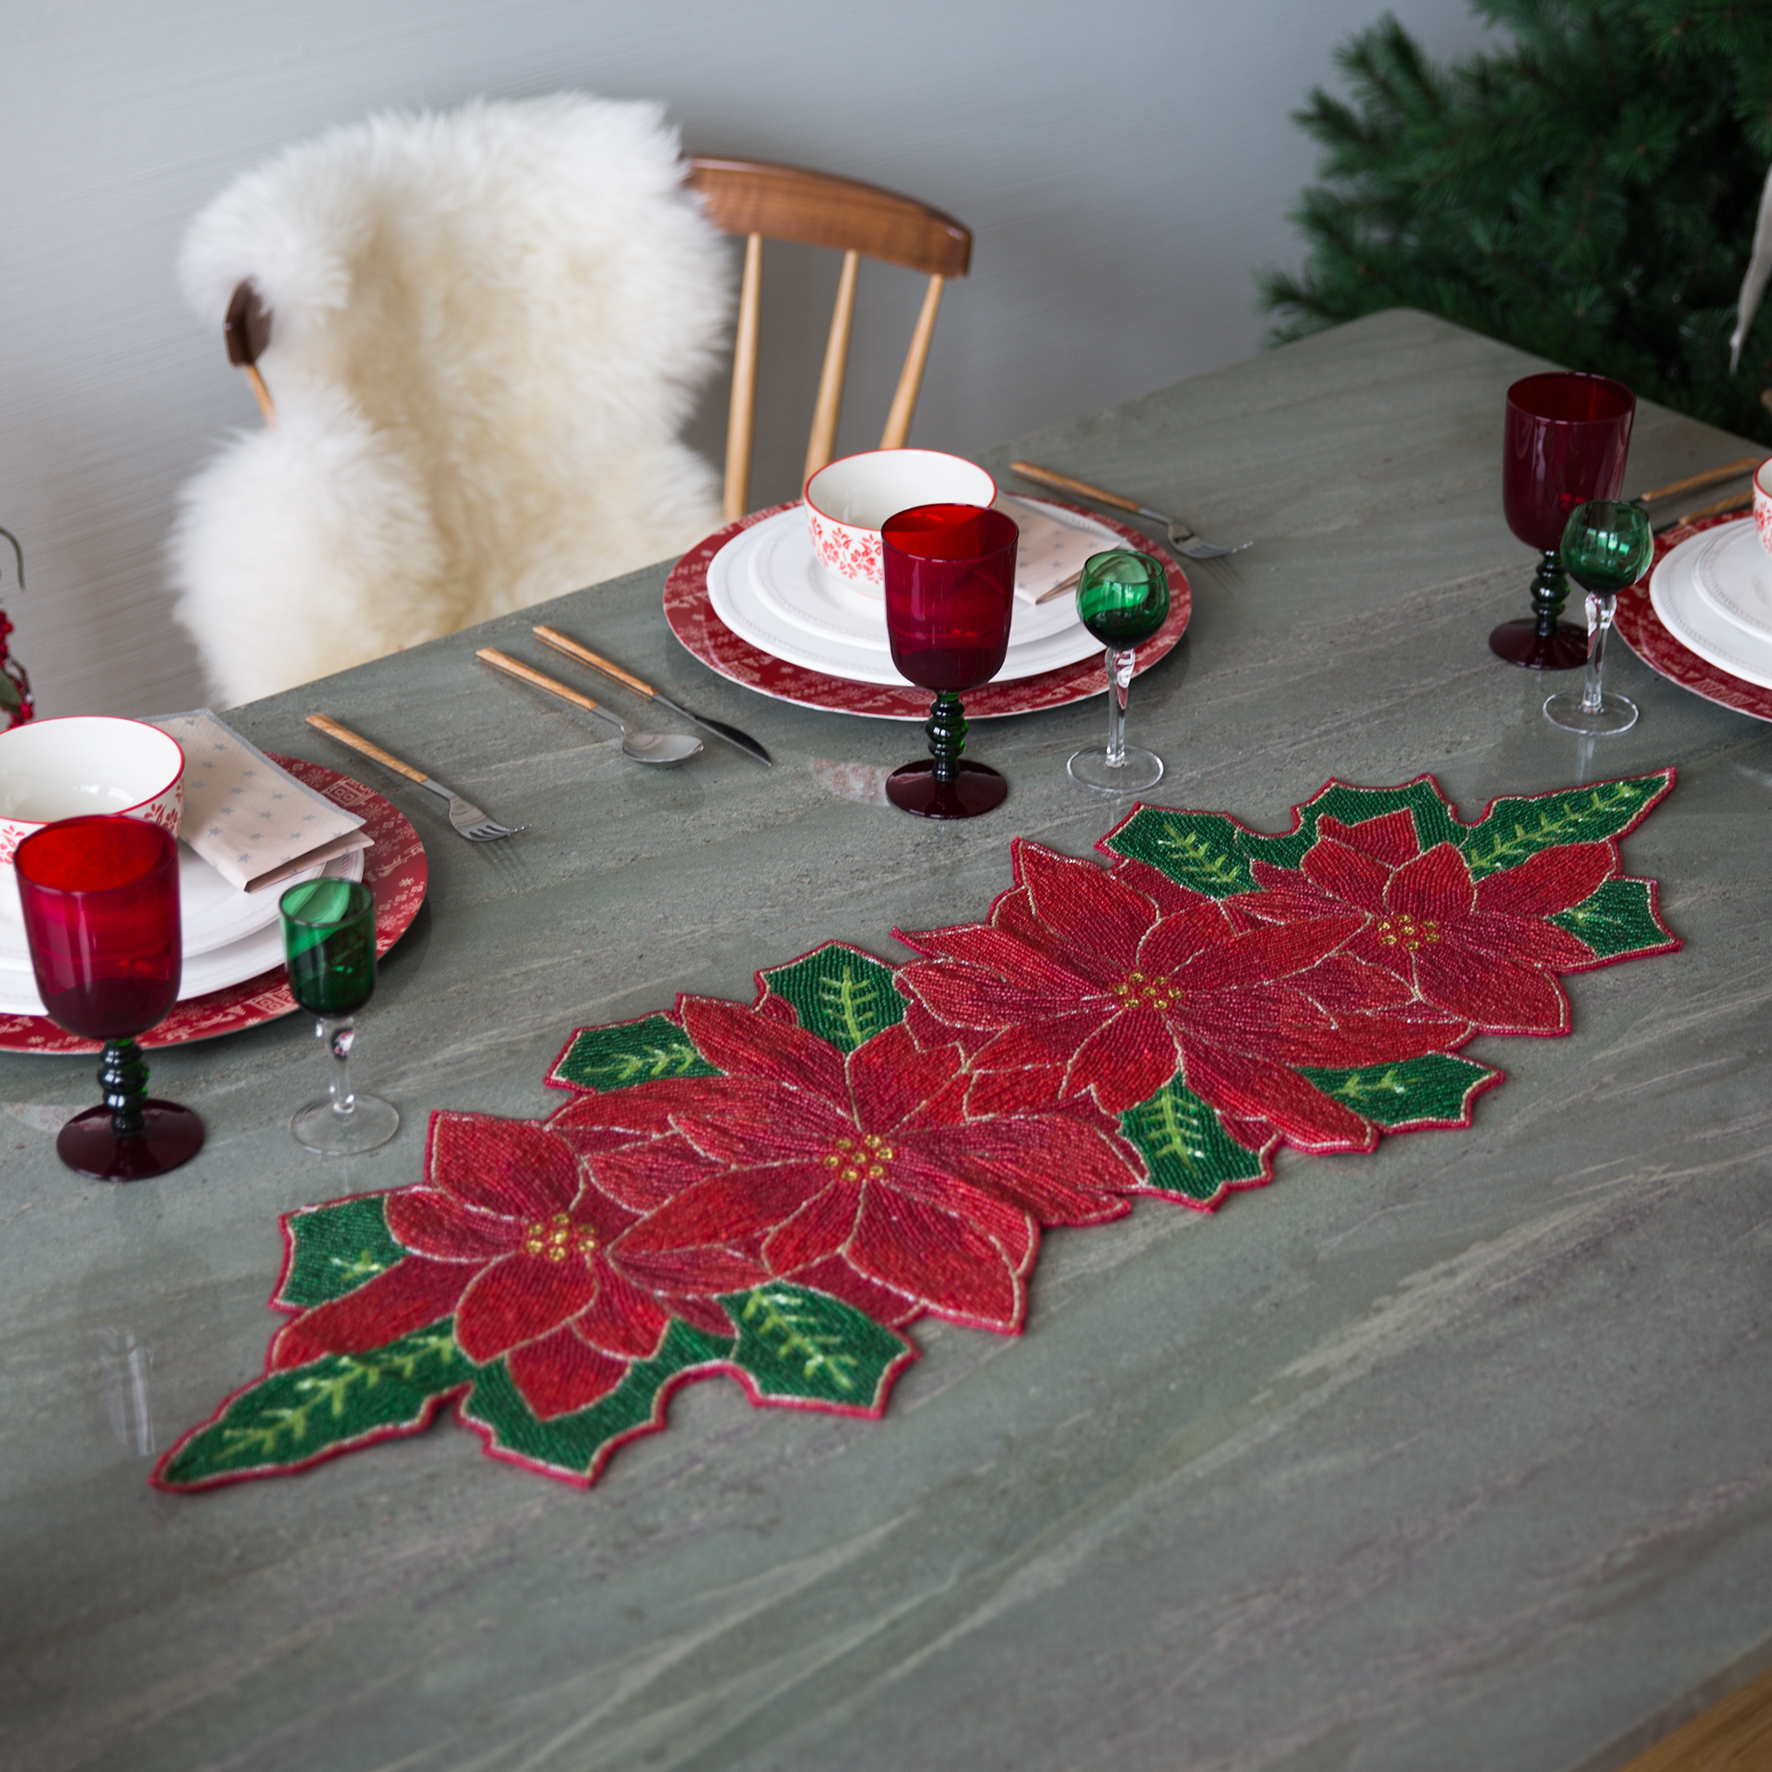 Tavola di Natale stella di Natale rossa